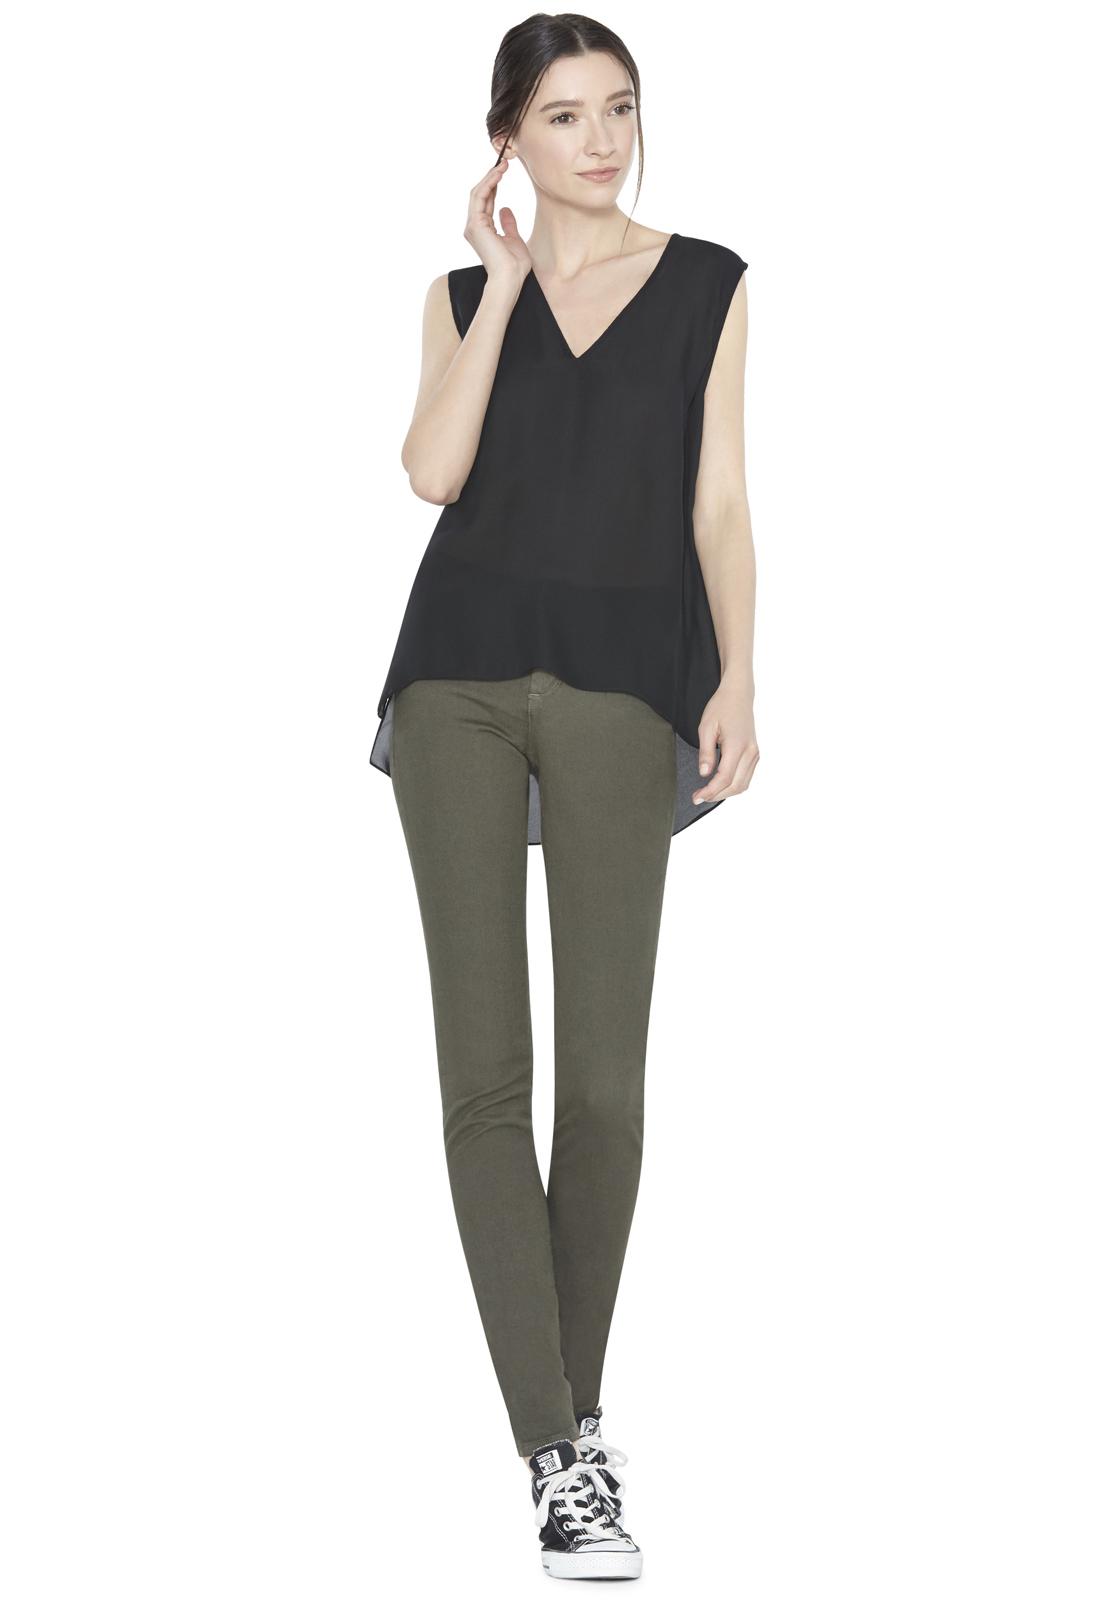 59676eebb7c434 Lyst - Alice + Olivia Low V-neck Sleeveless Top in Black